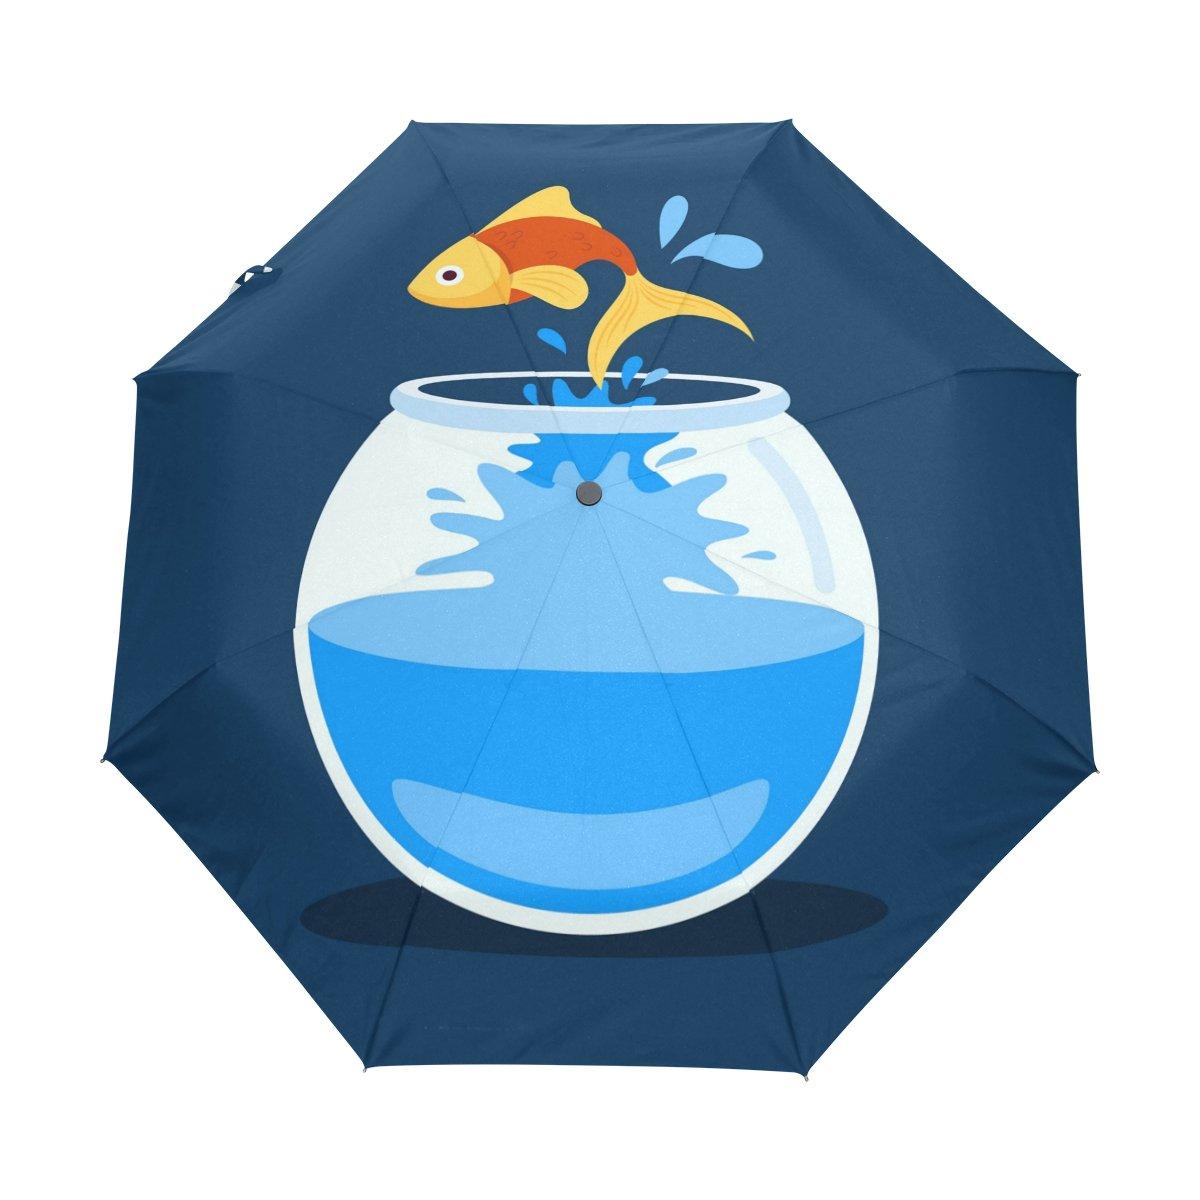 Senya Saobao防風と防雨トラベル傘with自動開いて閉じFolding Goldfish Jumpingポータブル折りたたみ式太陽雨傘 B07FD3WNPN